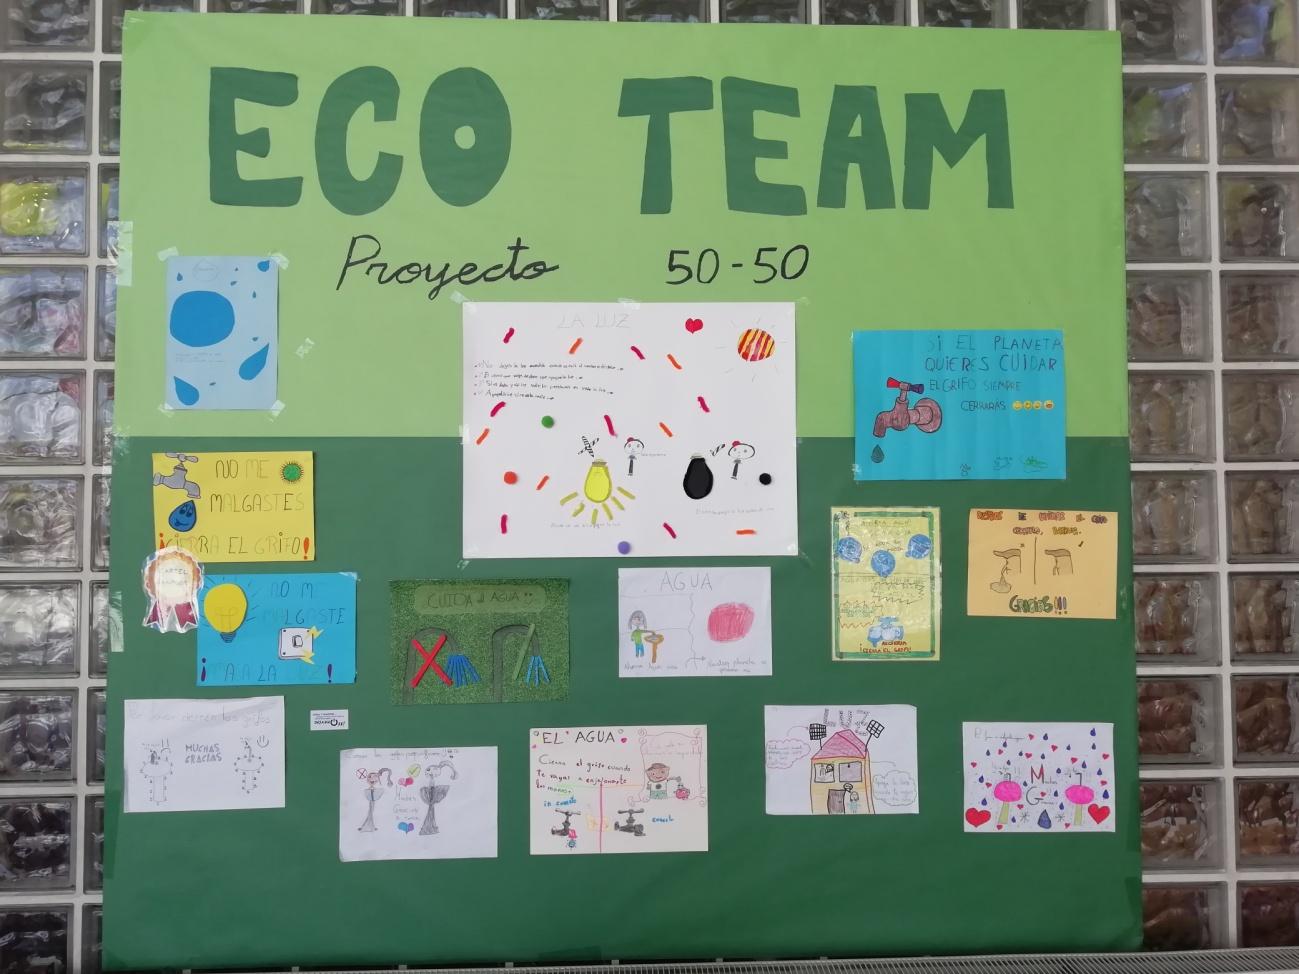 Proyecto 50/50